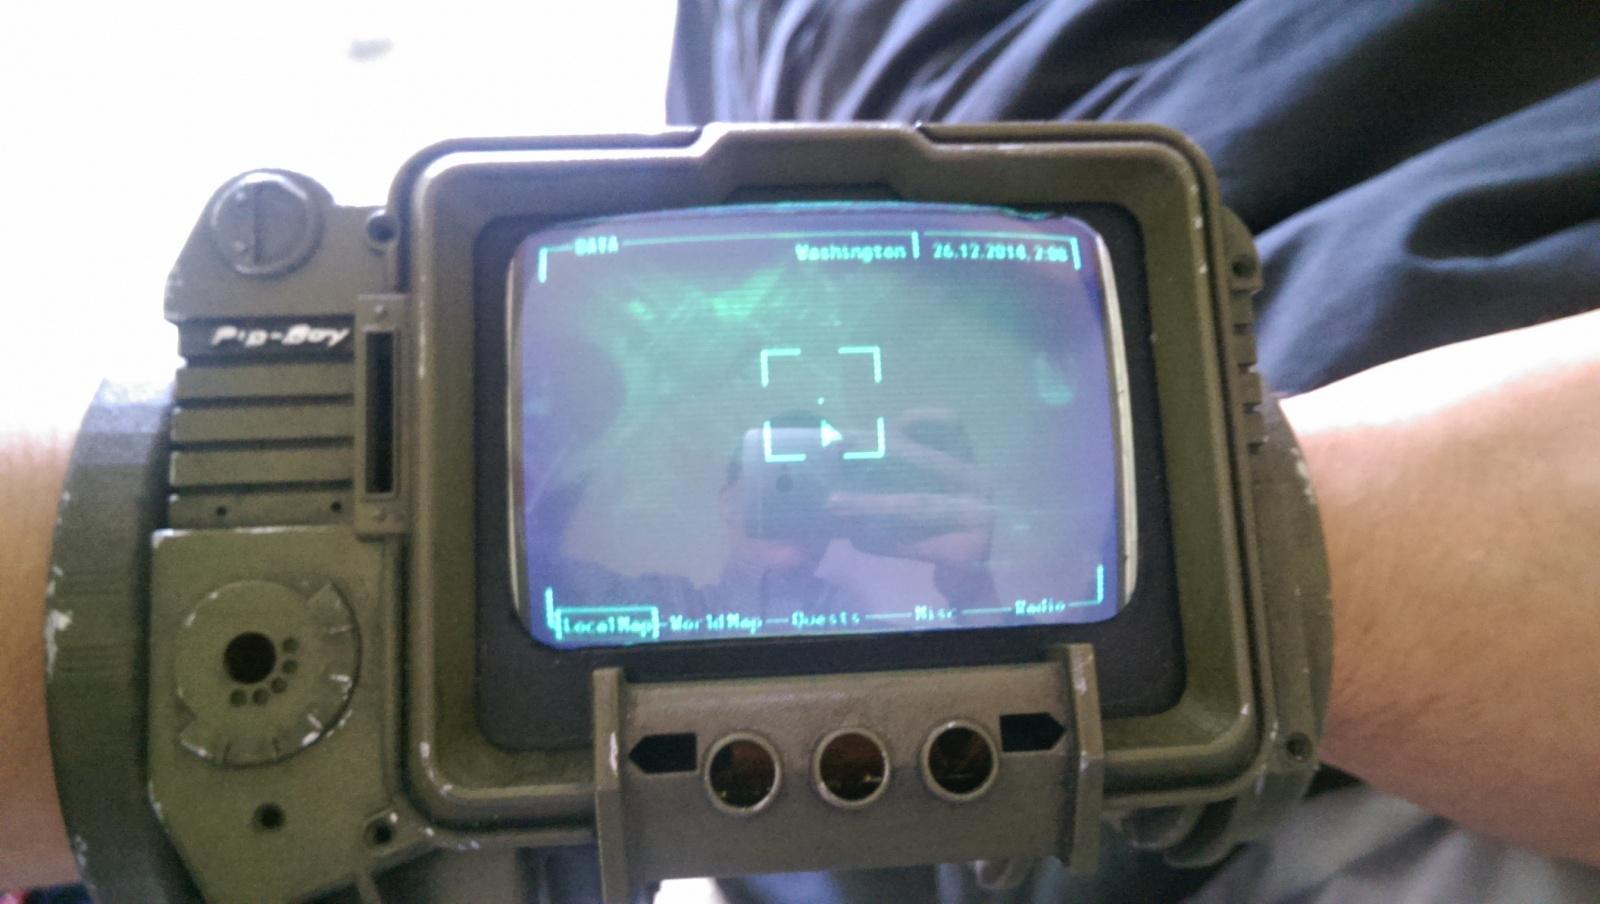 PipBoy из Fallout 3 на Raspberry Pi - 12